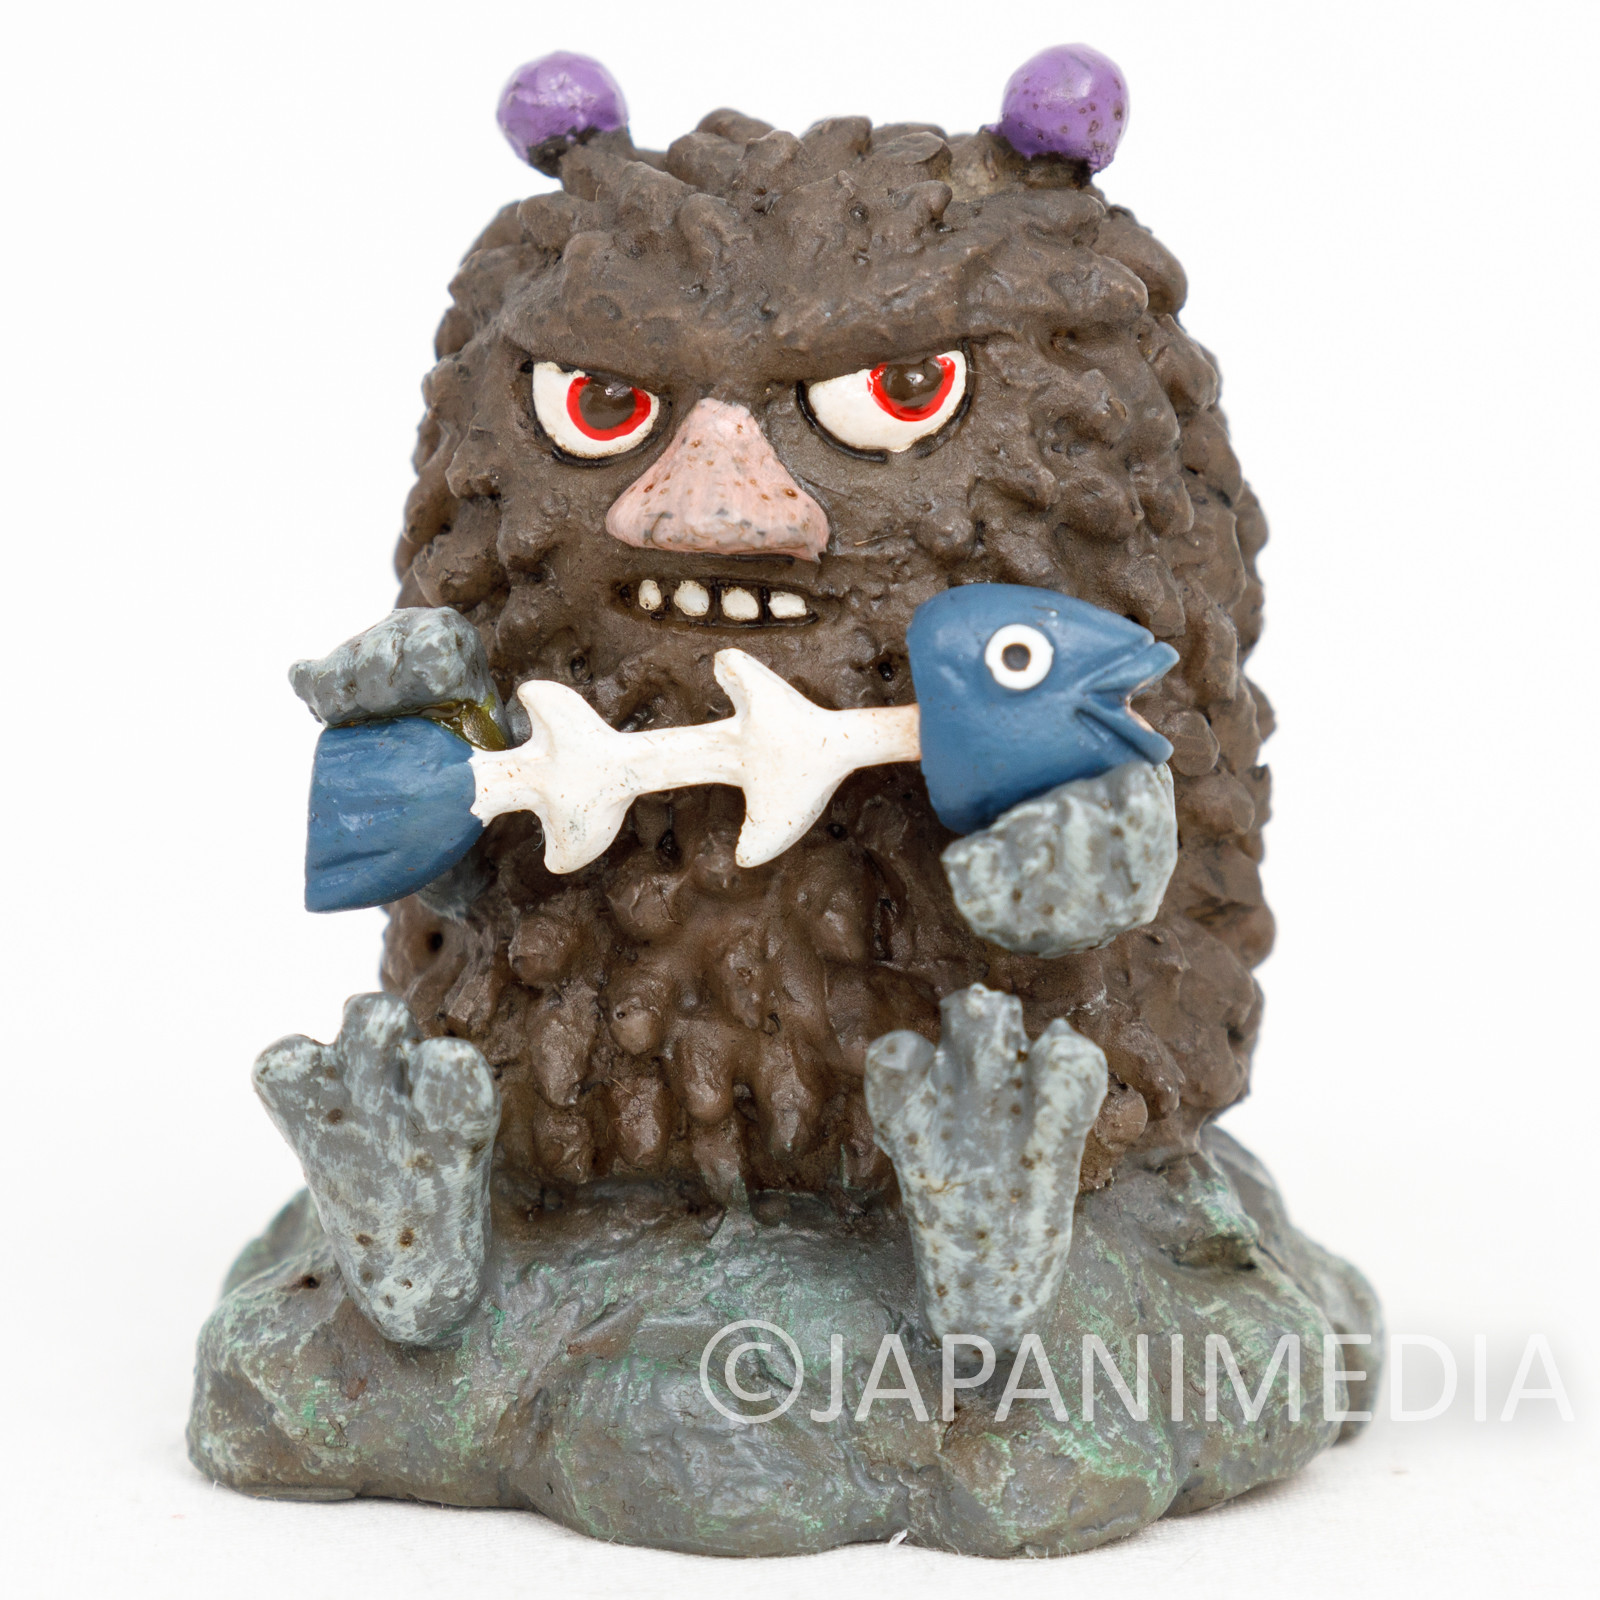 RARE! Moomin Characters Stinky Original Comics Ver. Mini Figure Benelic